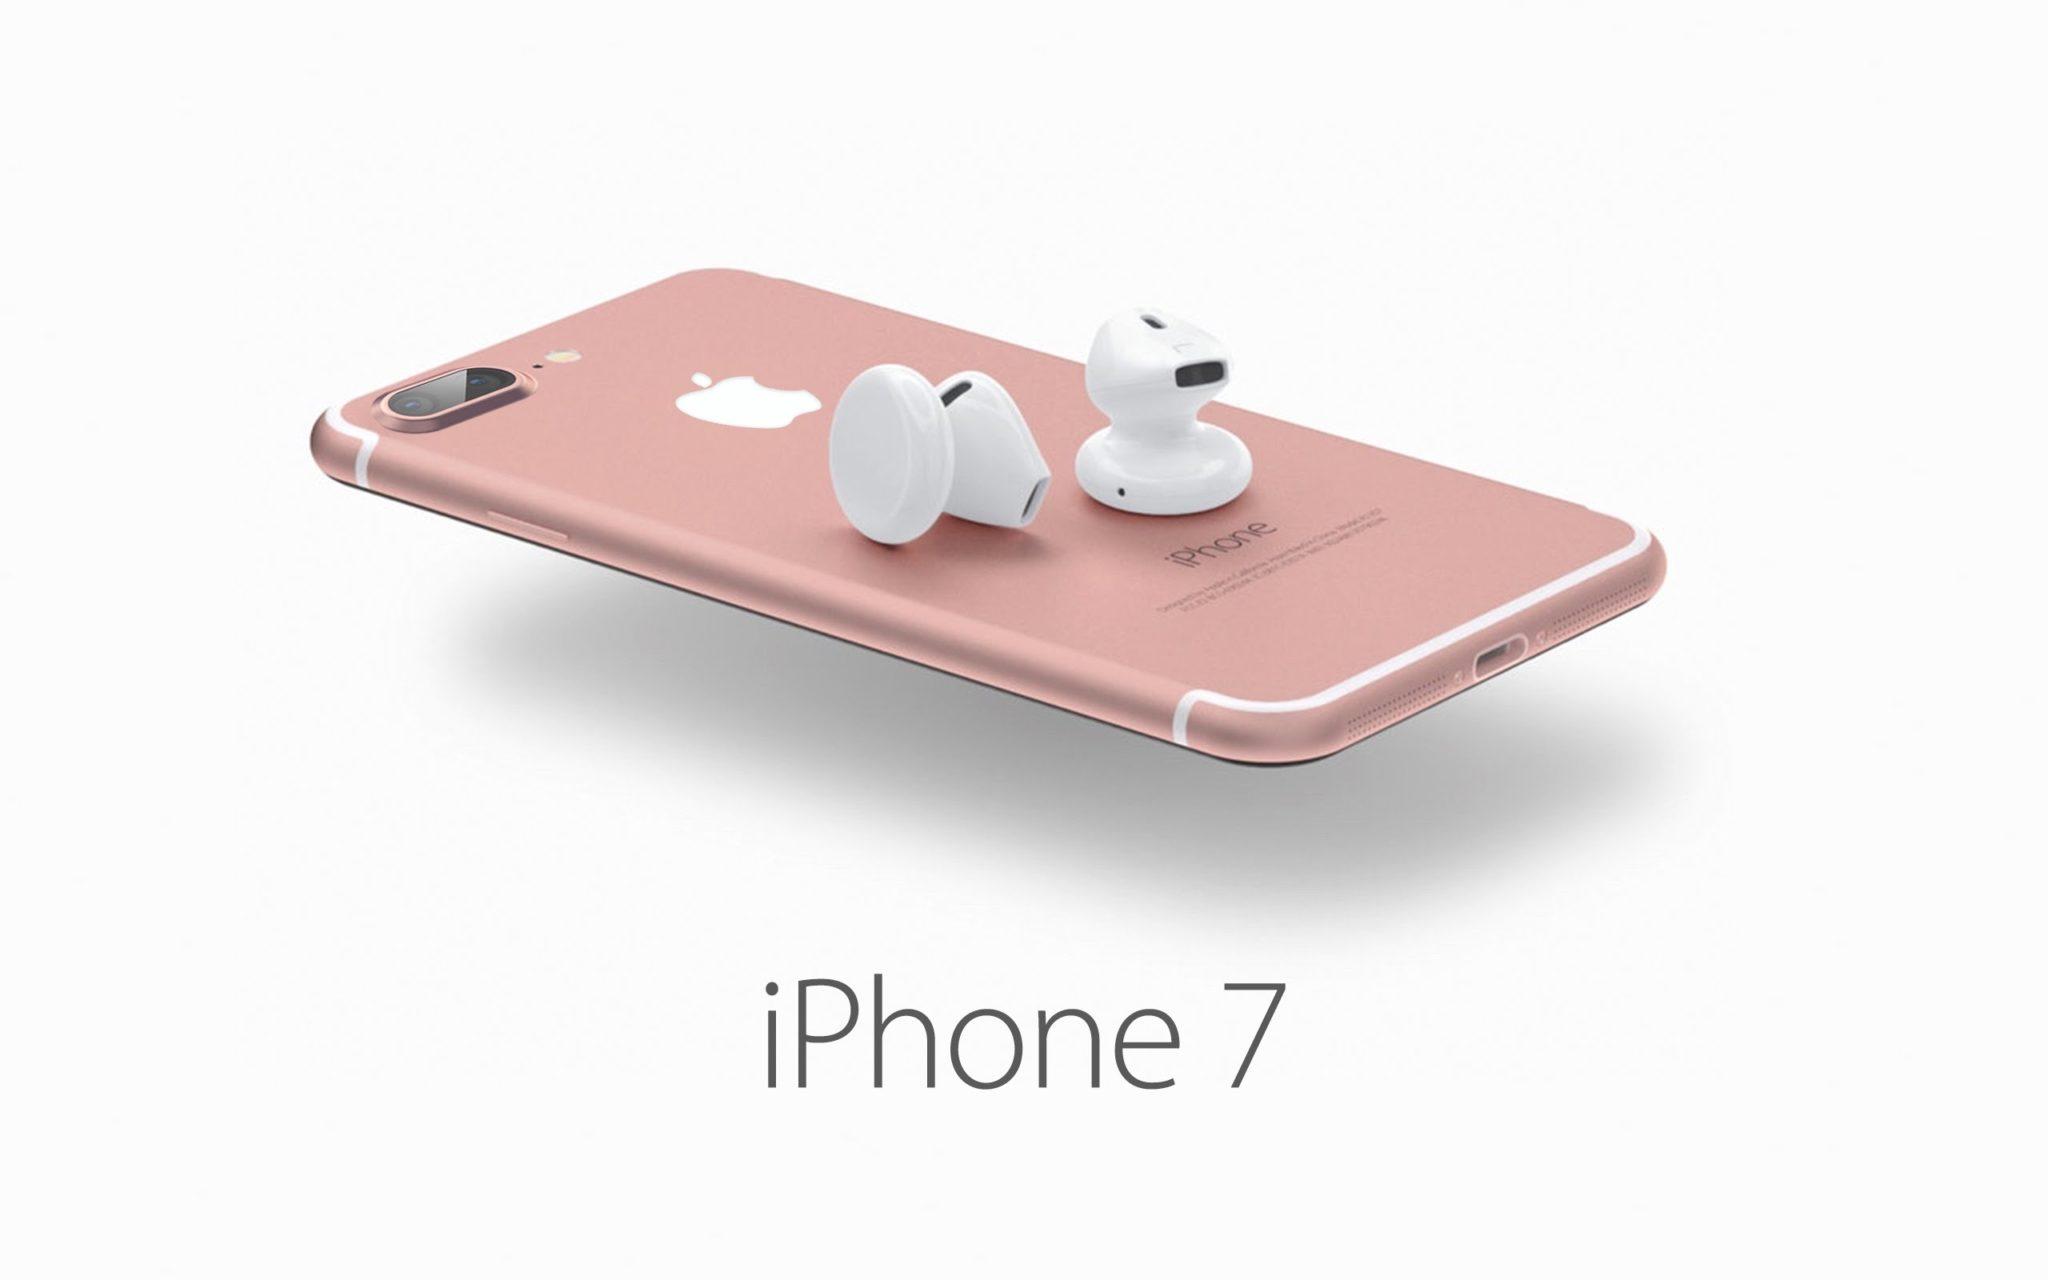 iphone 7 keynote